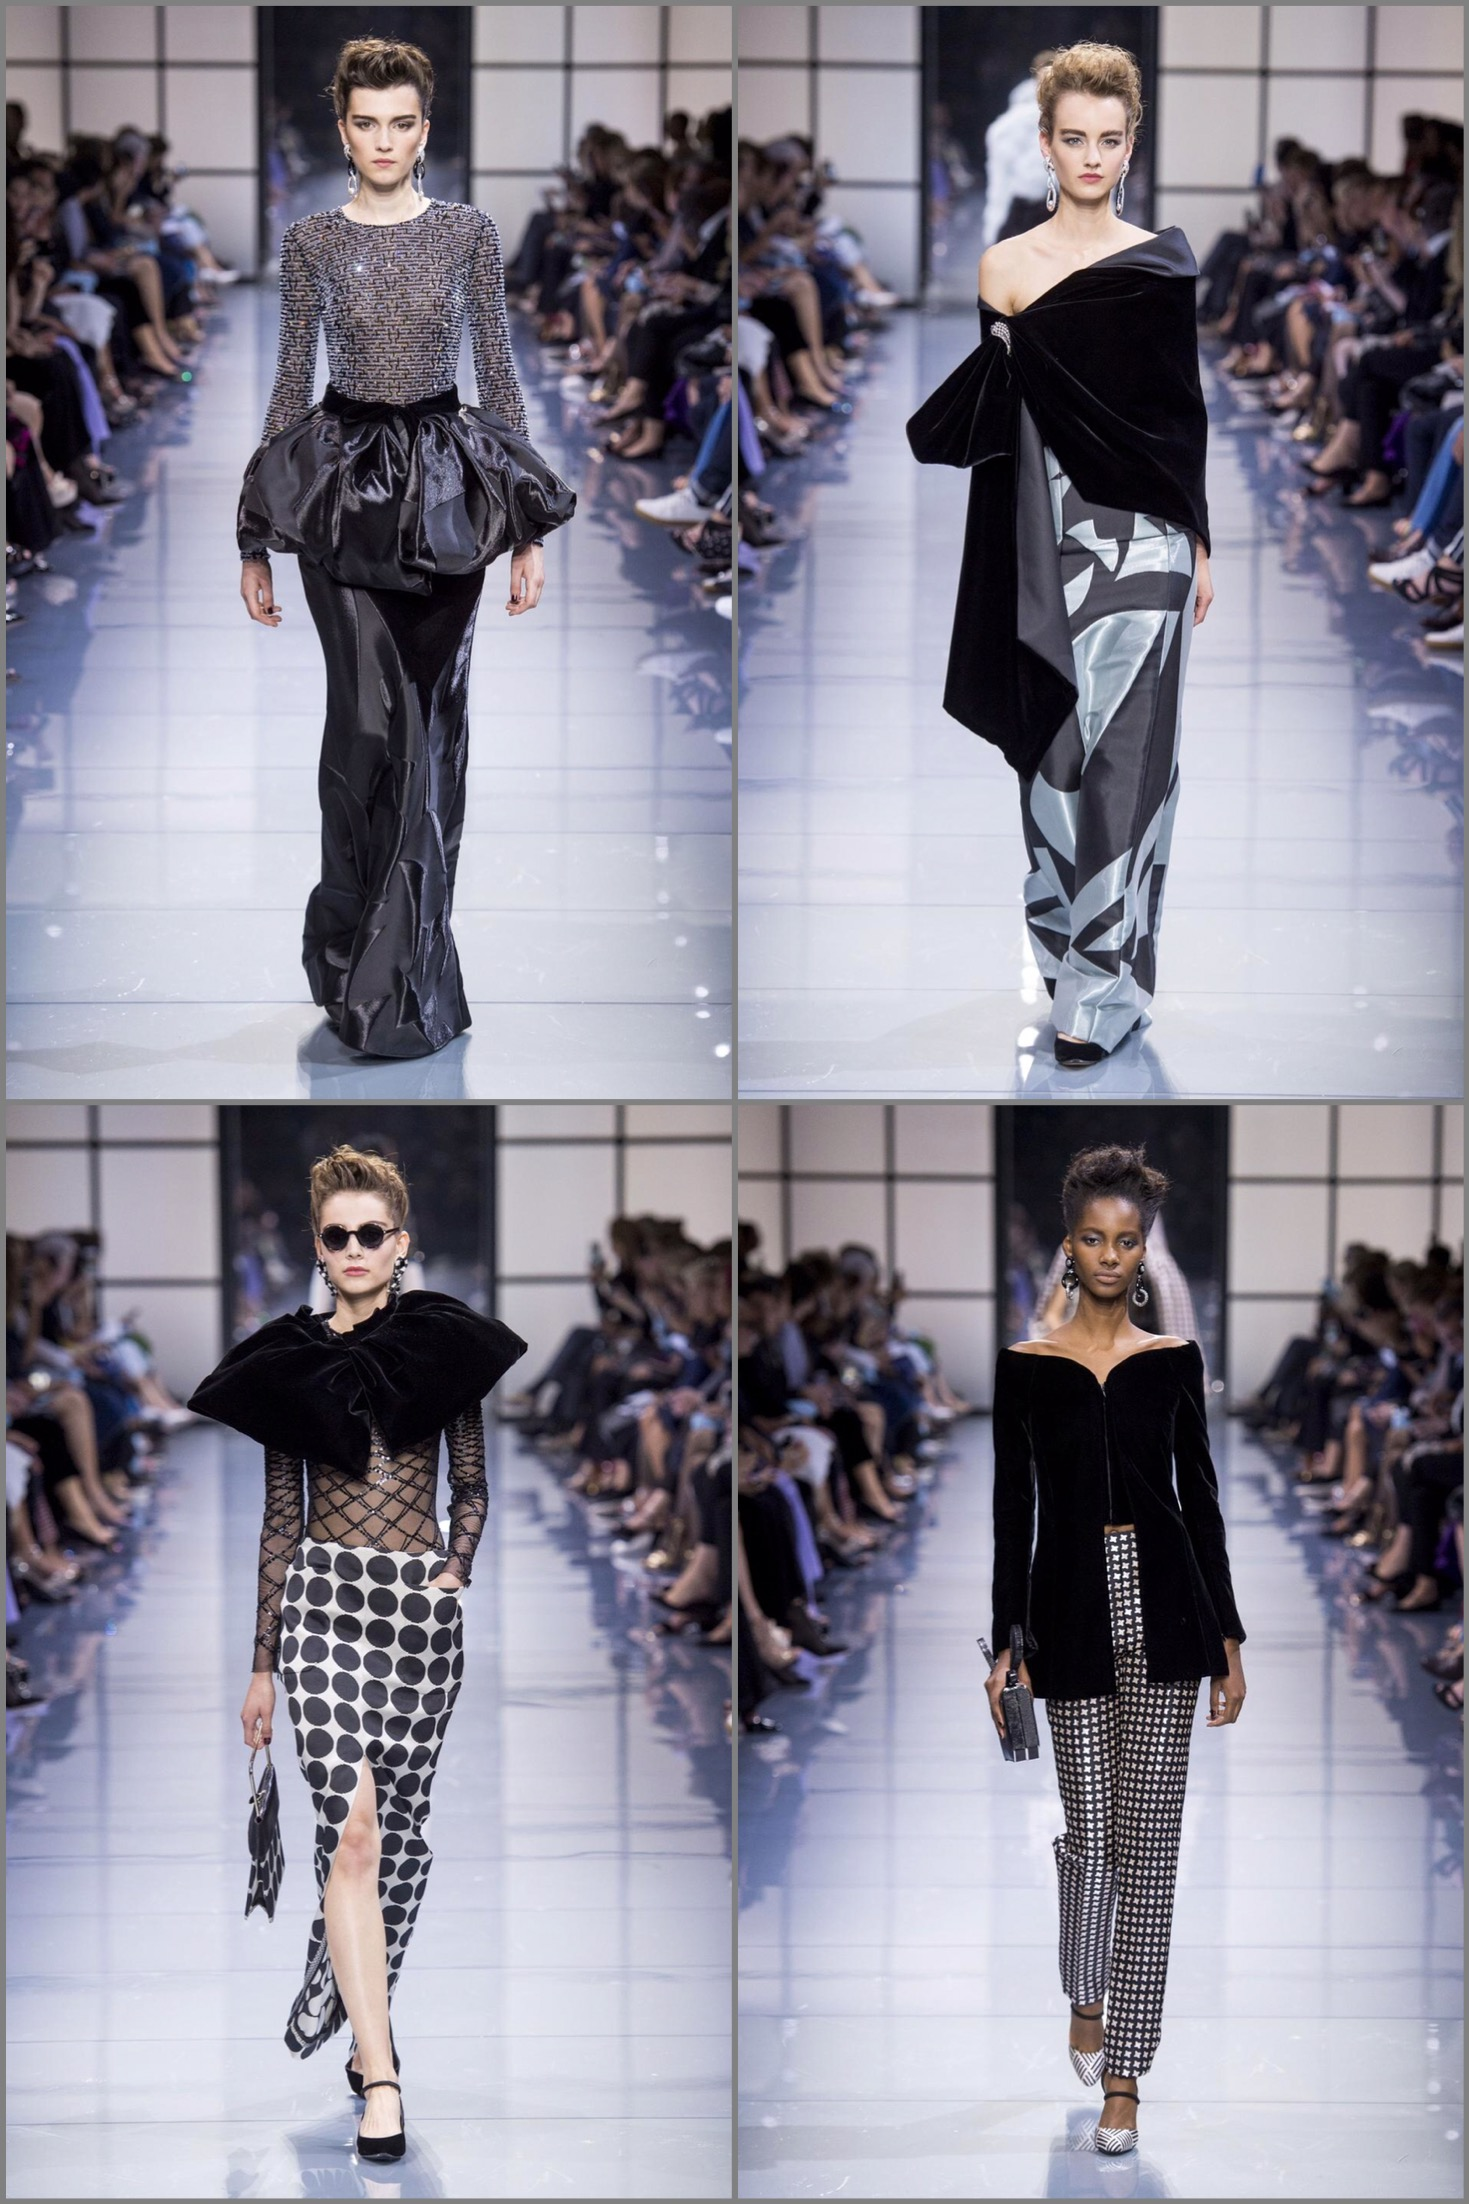 Paris Couture Week Fall Winter 2016-2017 - Giorgio Armani Privé